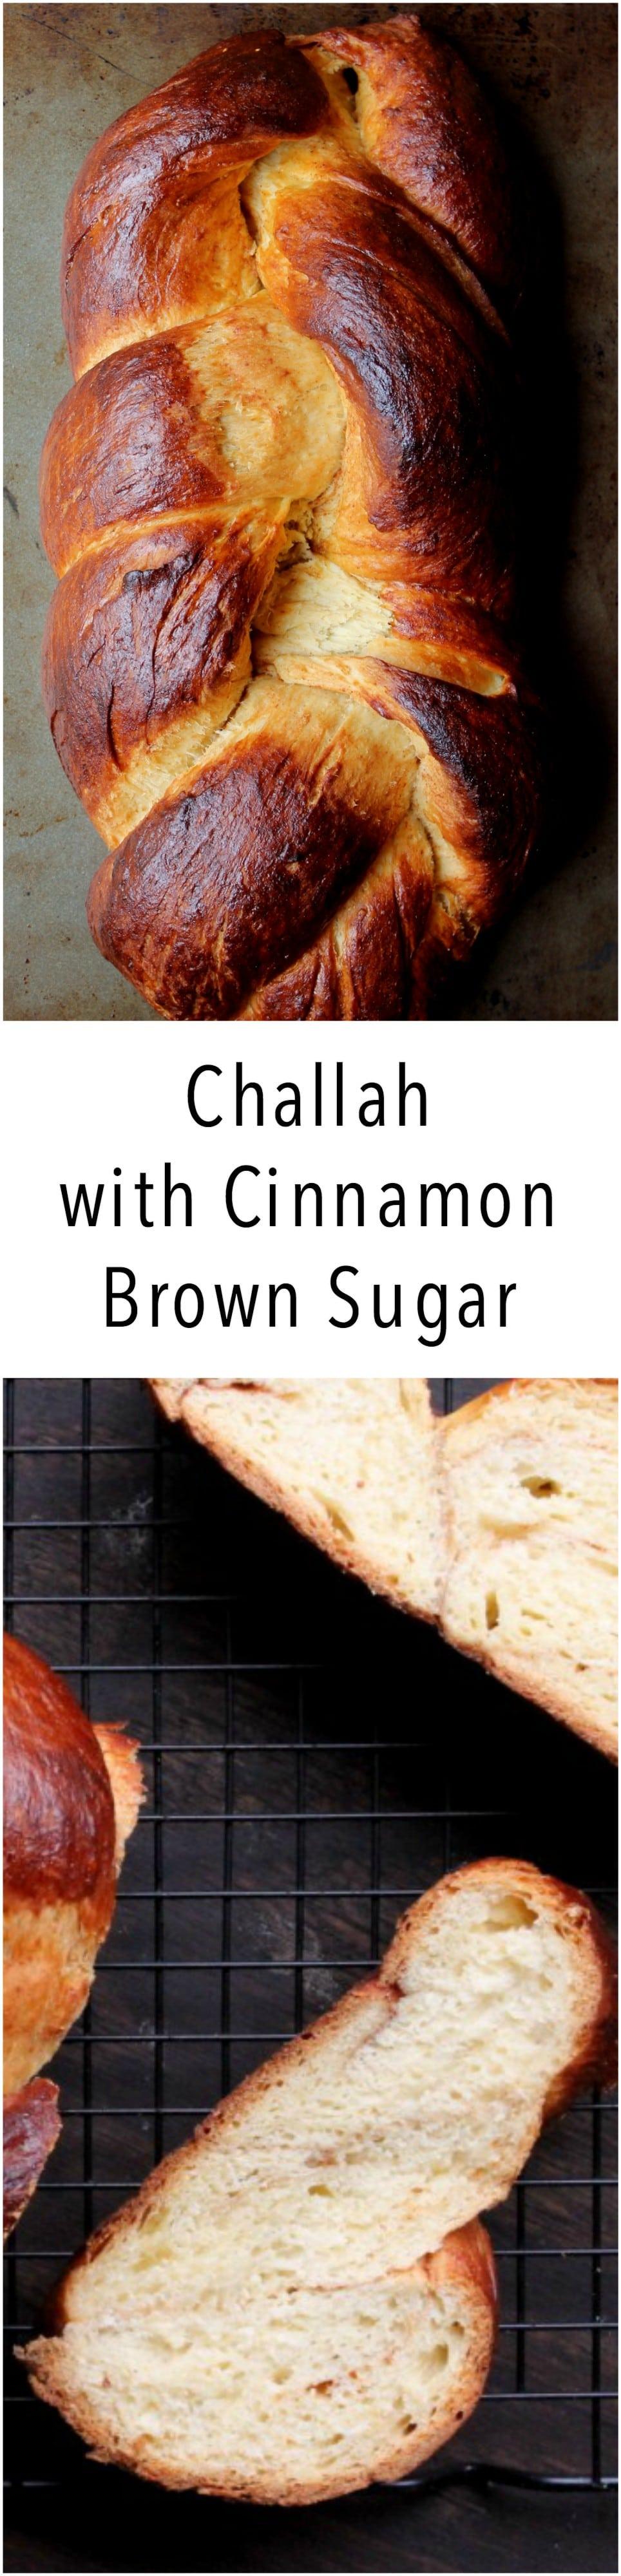 challah-with-cinnamon-brown-sugar.jpg